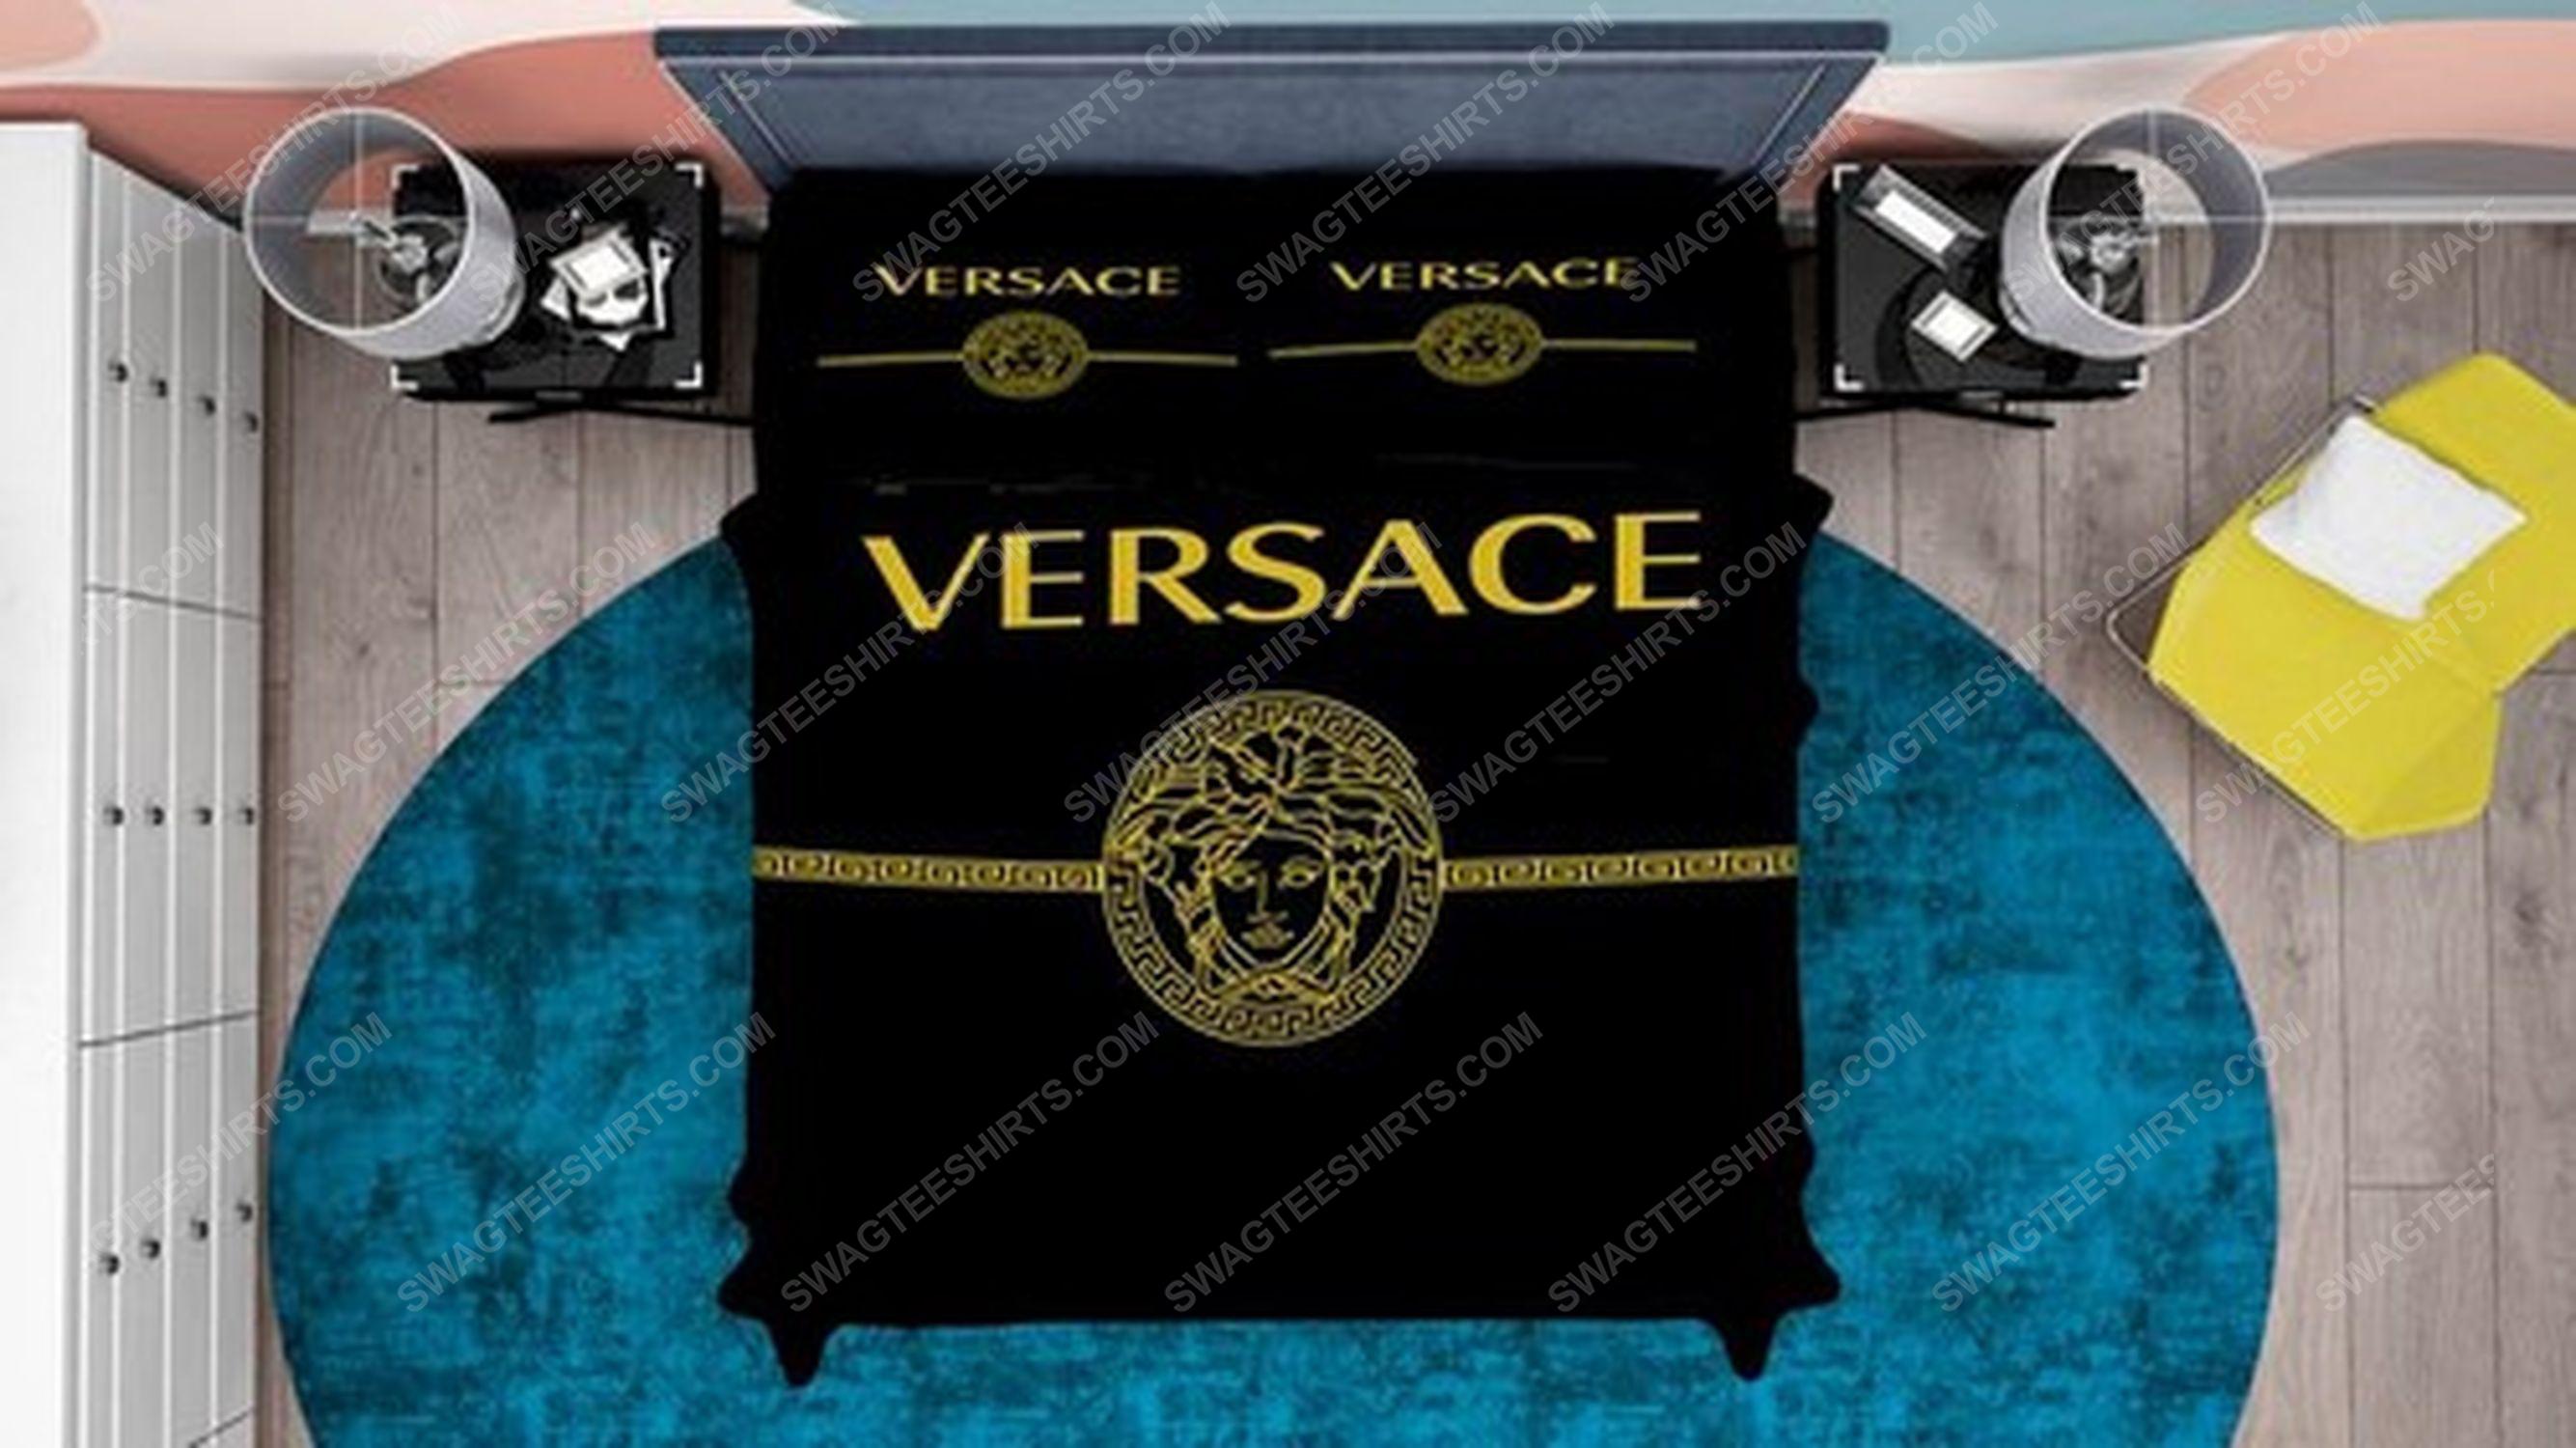 Versace black and gold full print duvet cover bedding set 3